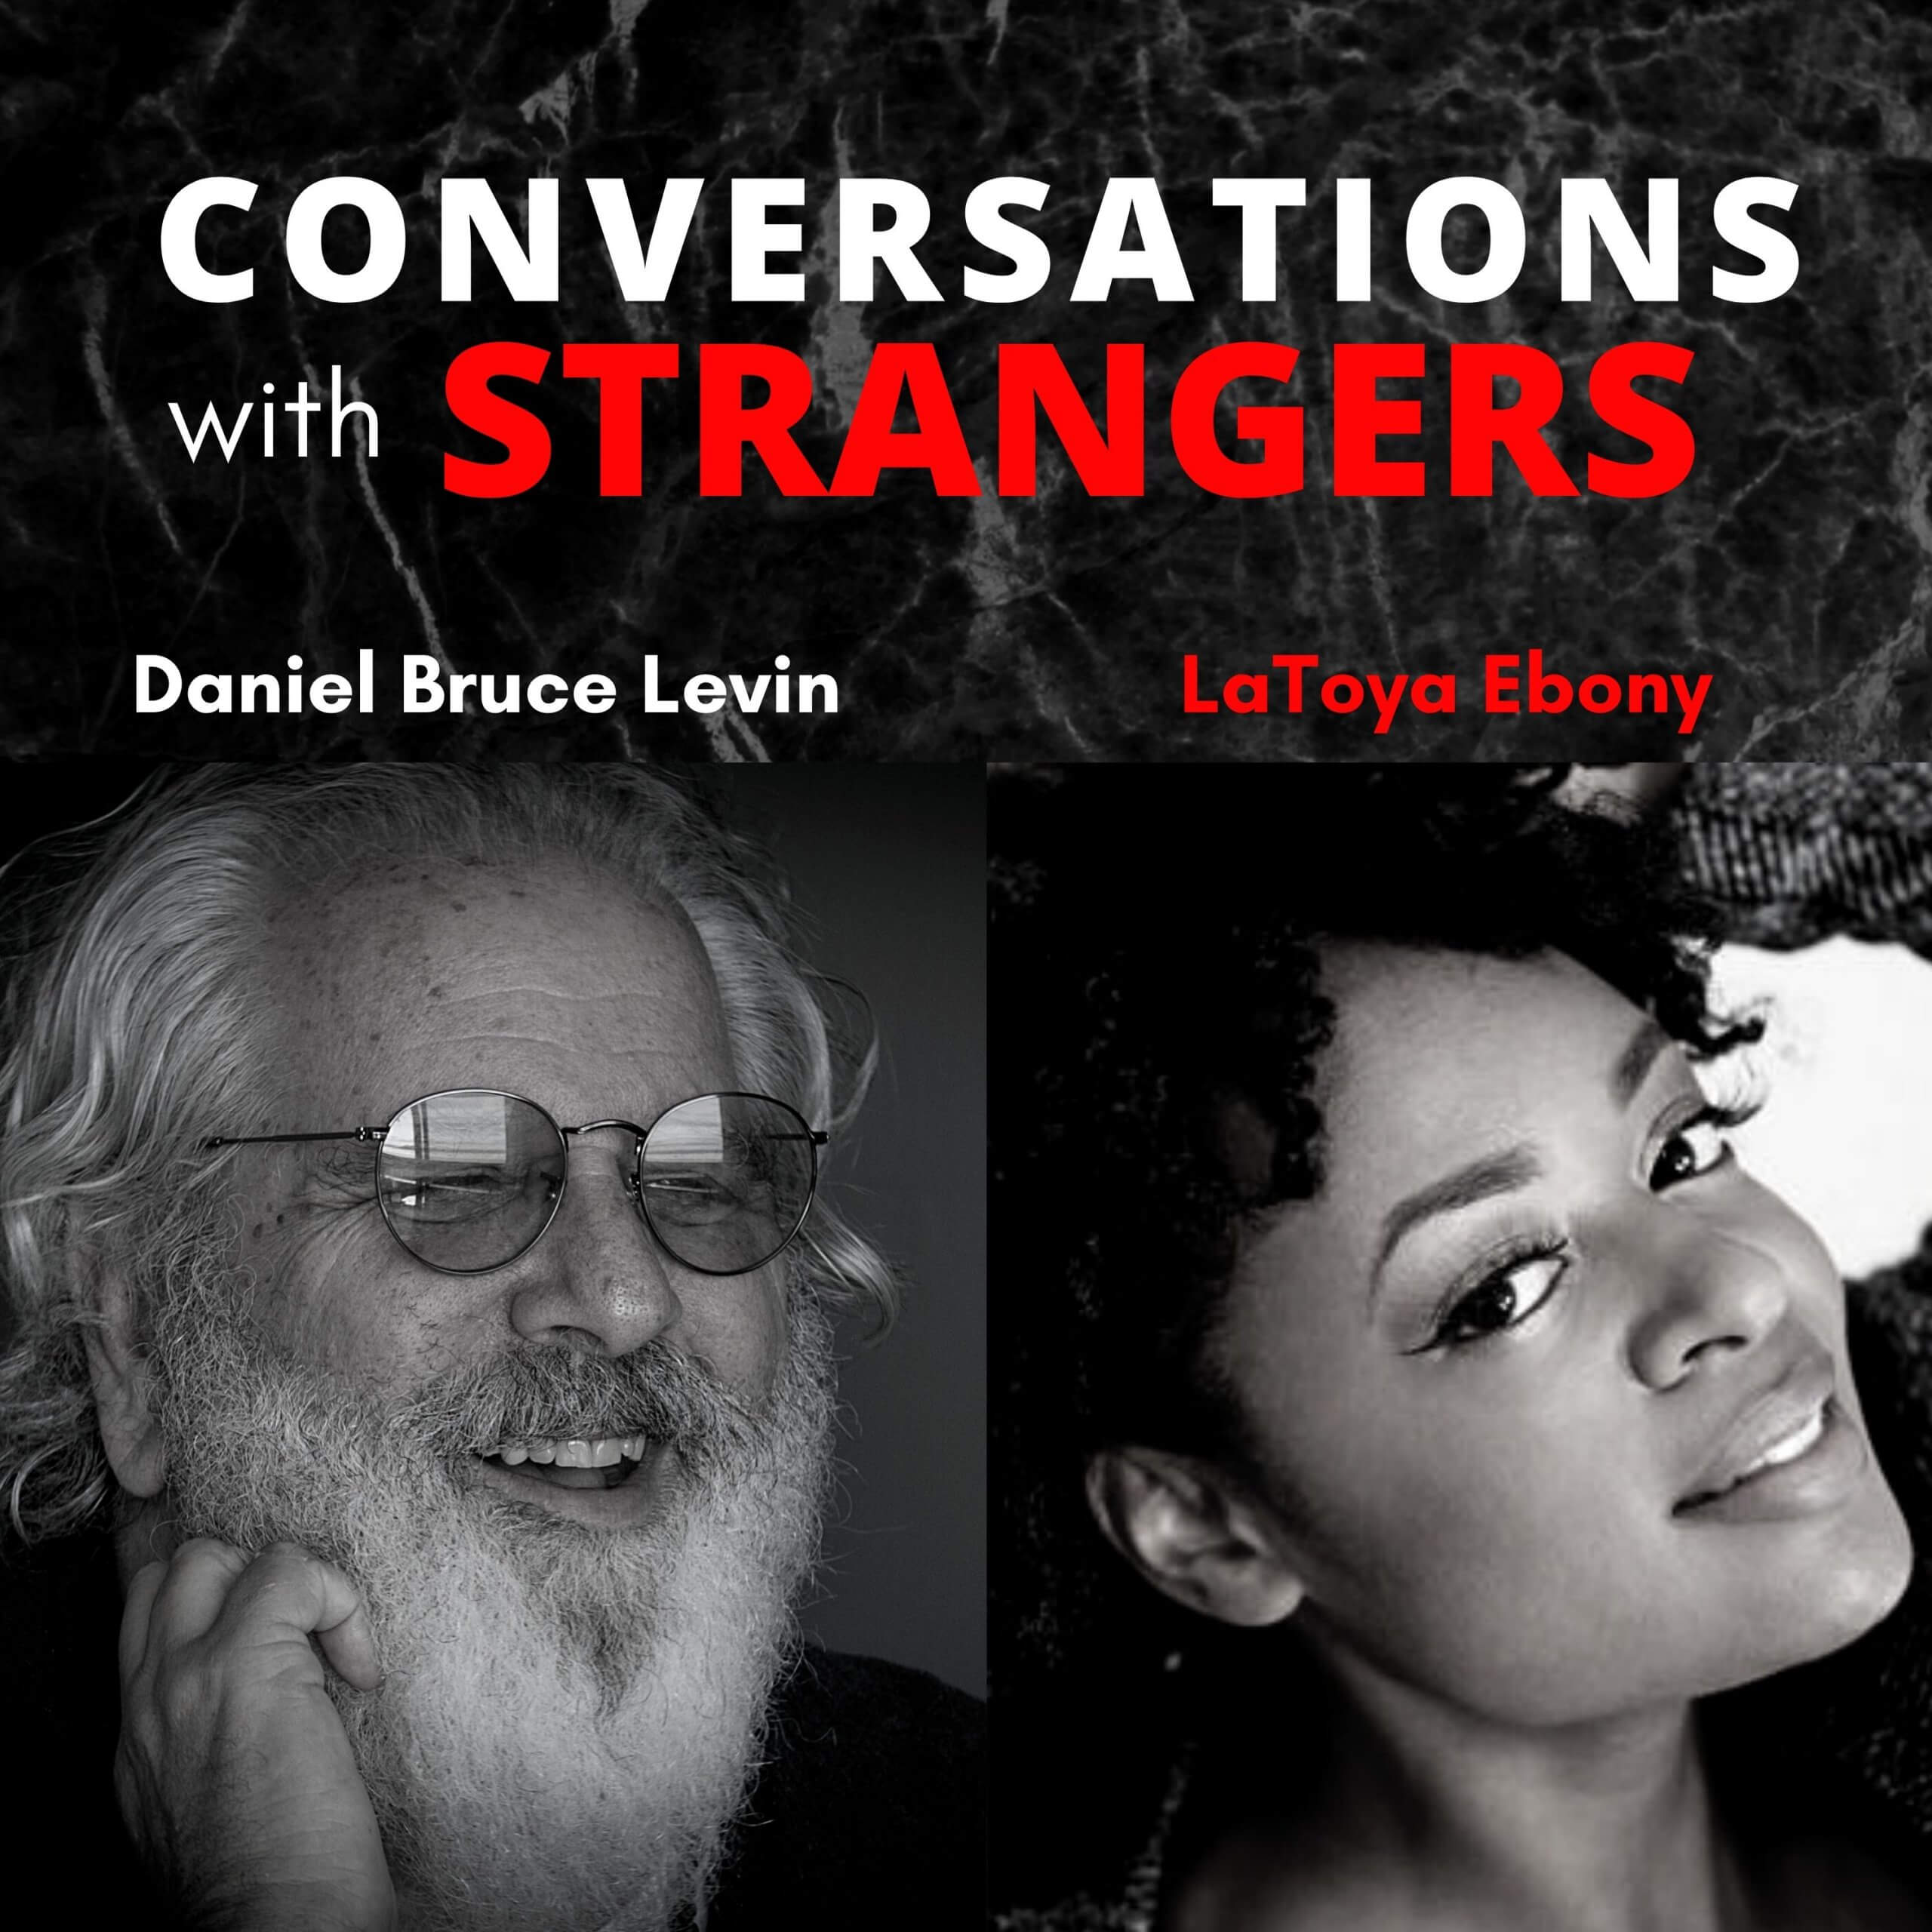 Conversations with Strangers feat. LaToya Ebony